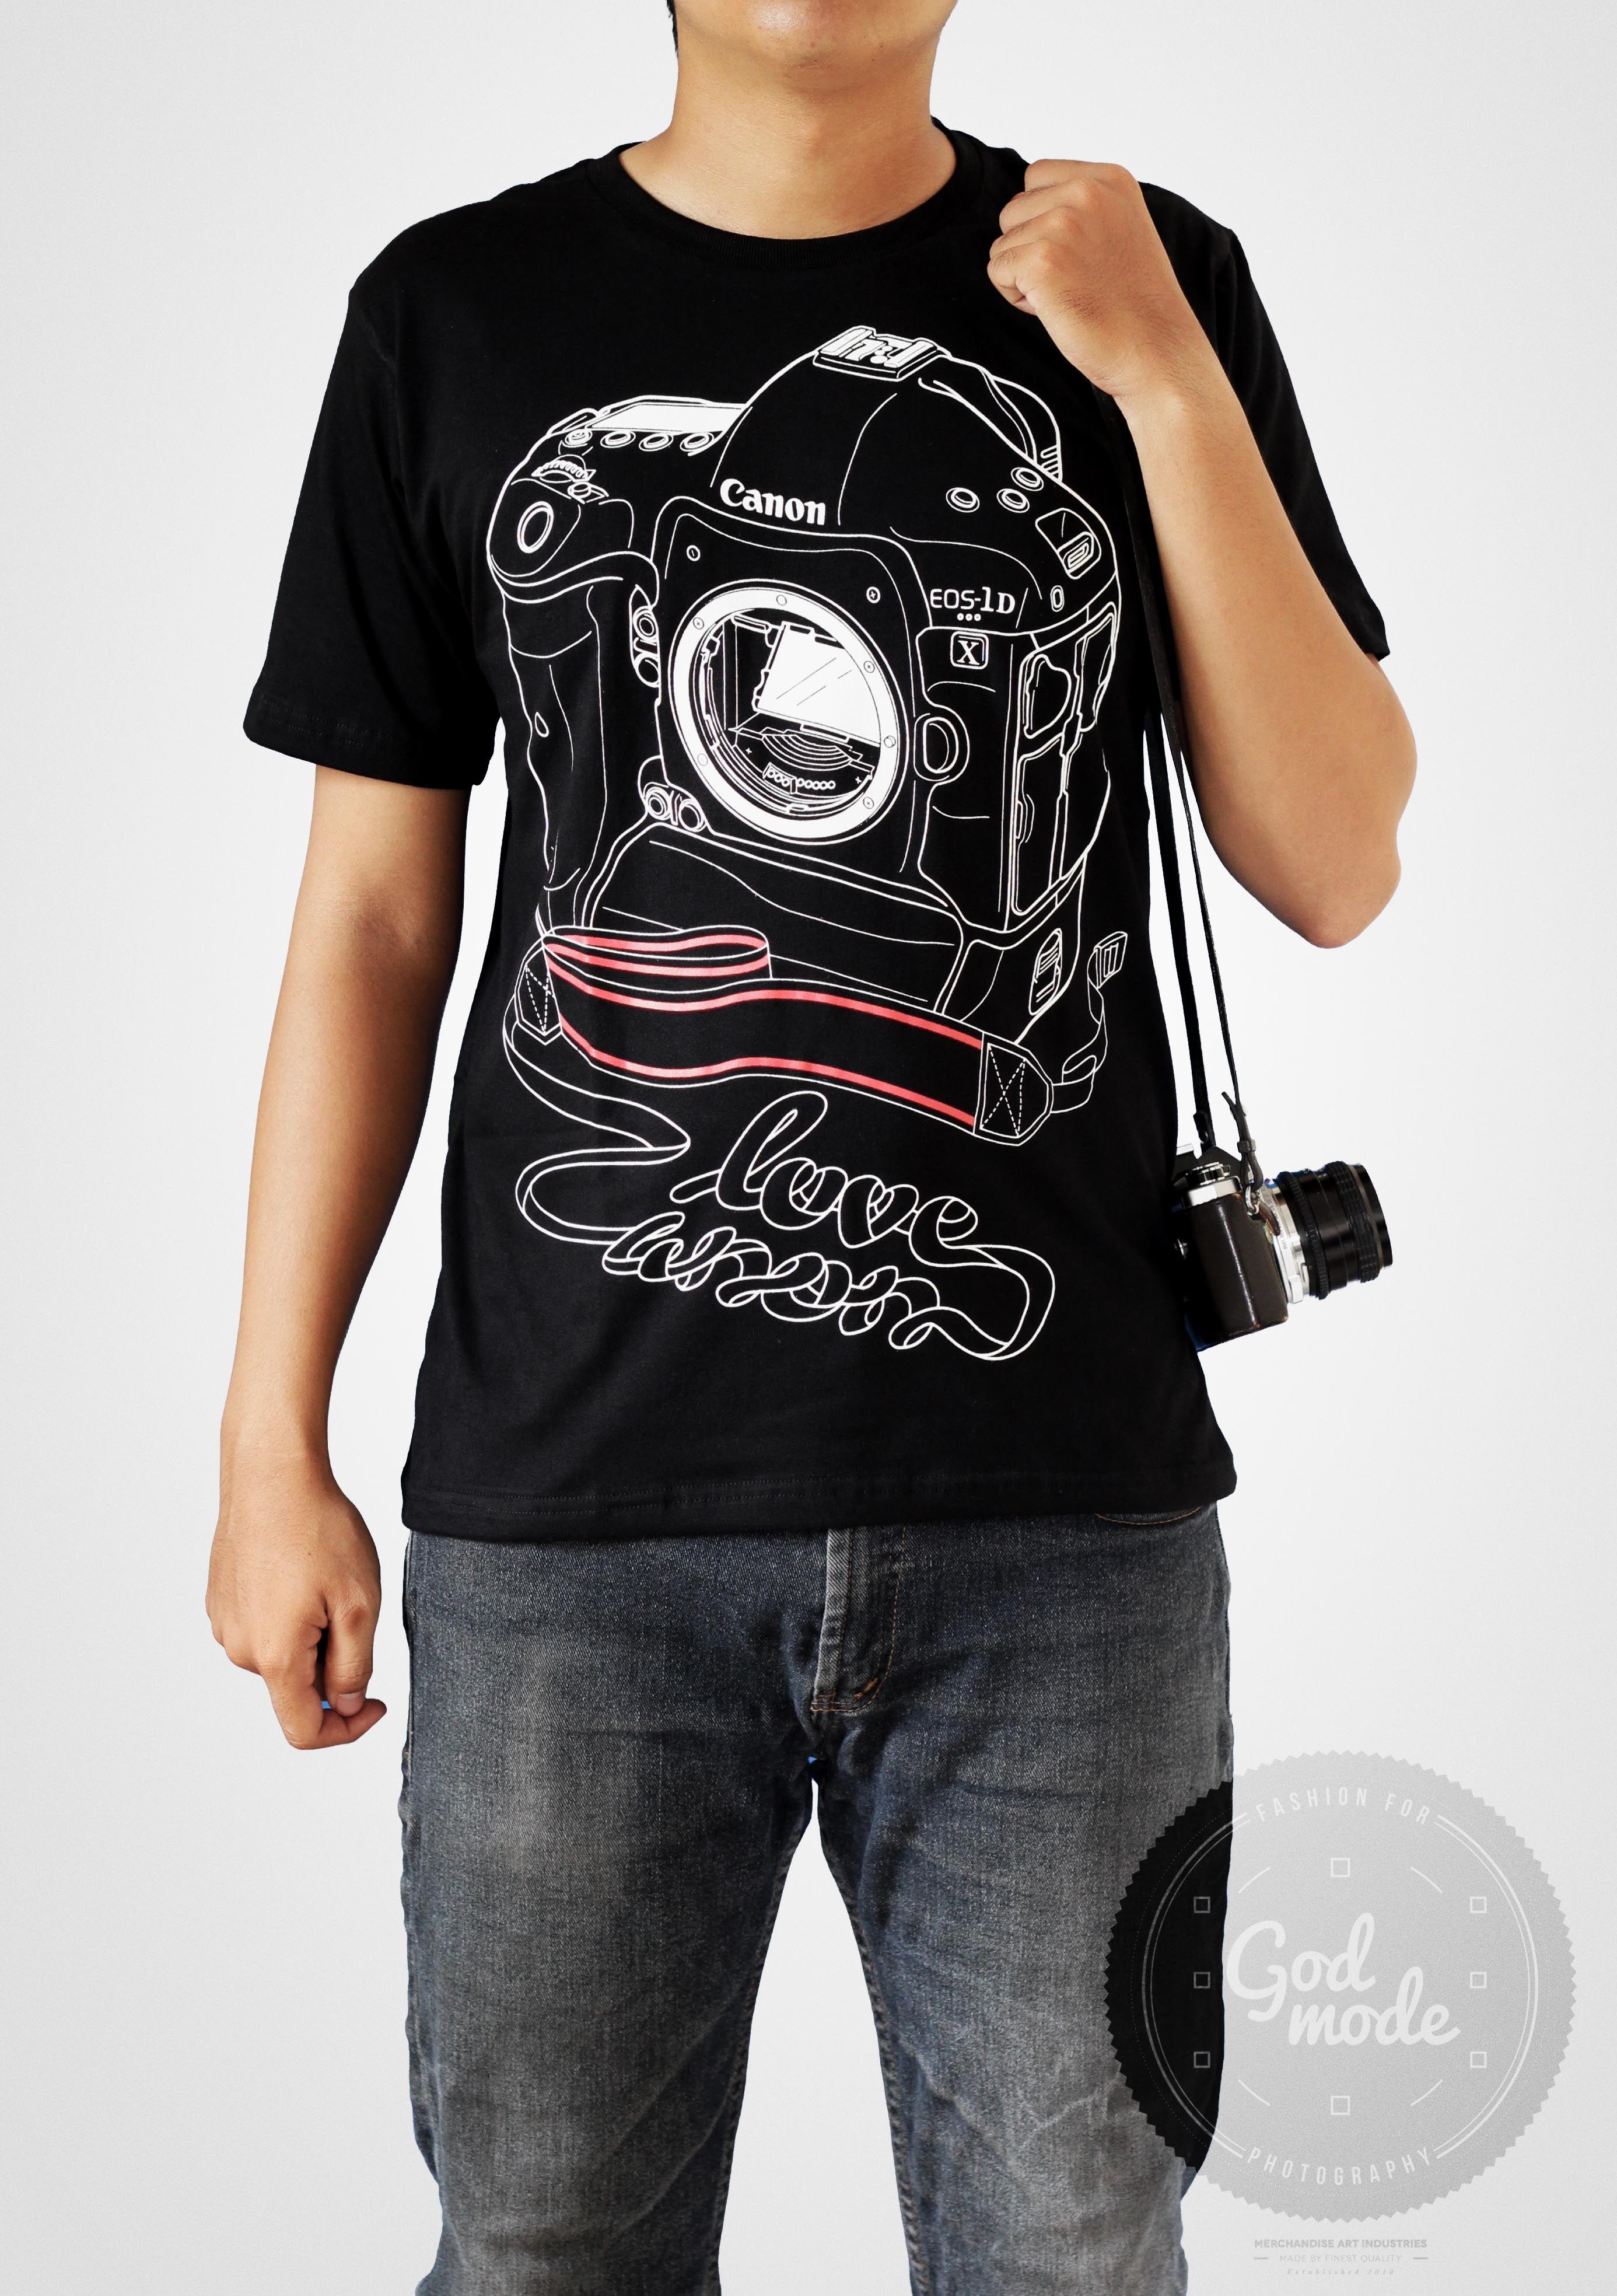 Black t shirt ebay -  18 Usd Canon T Shirt Photography Love Art